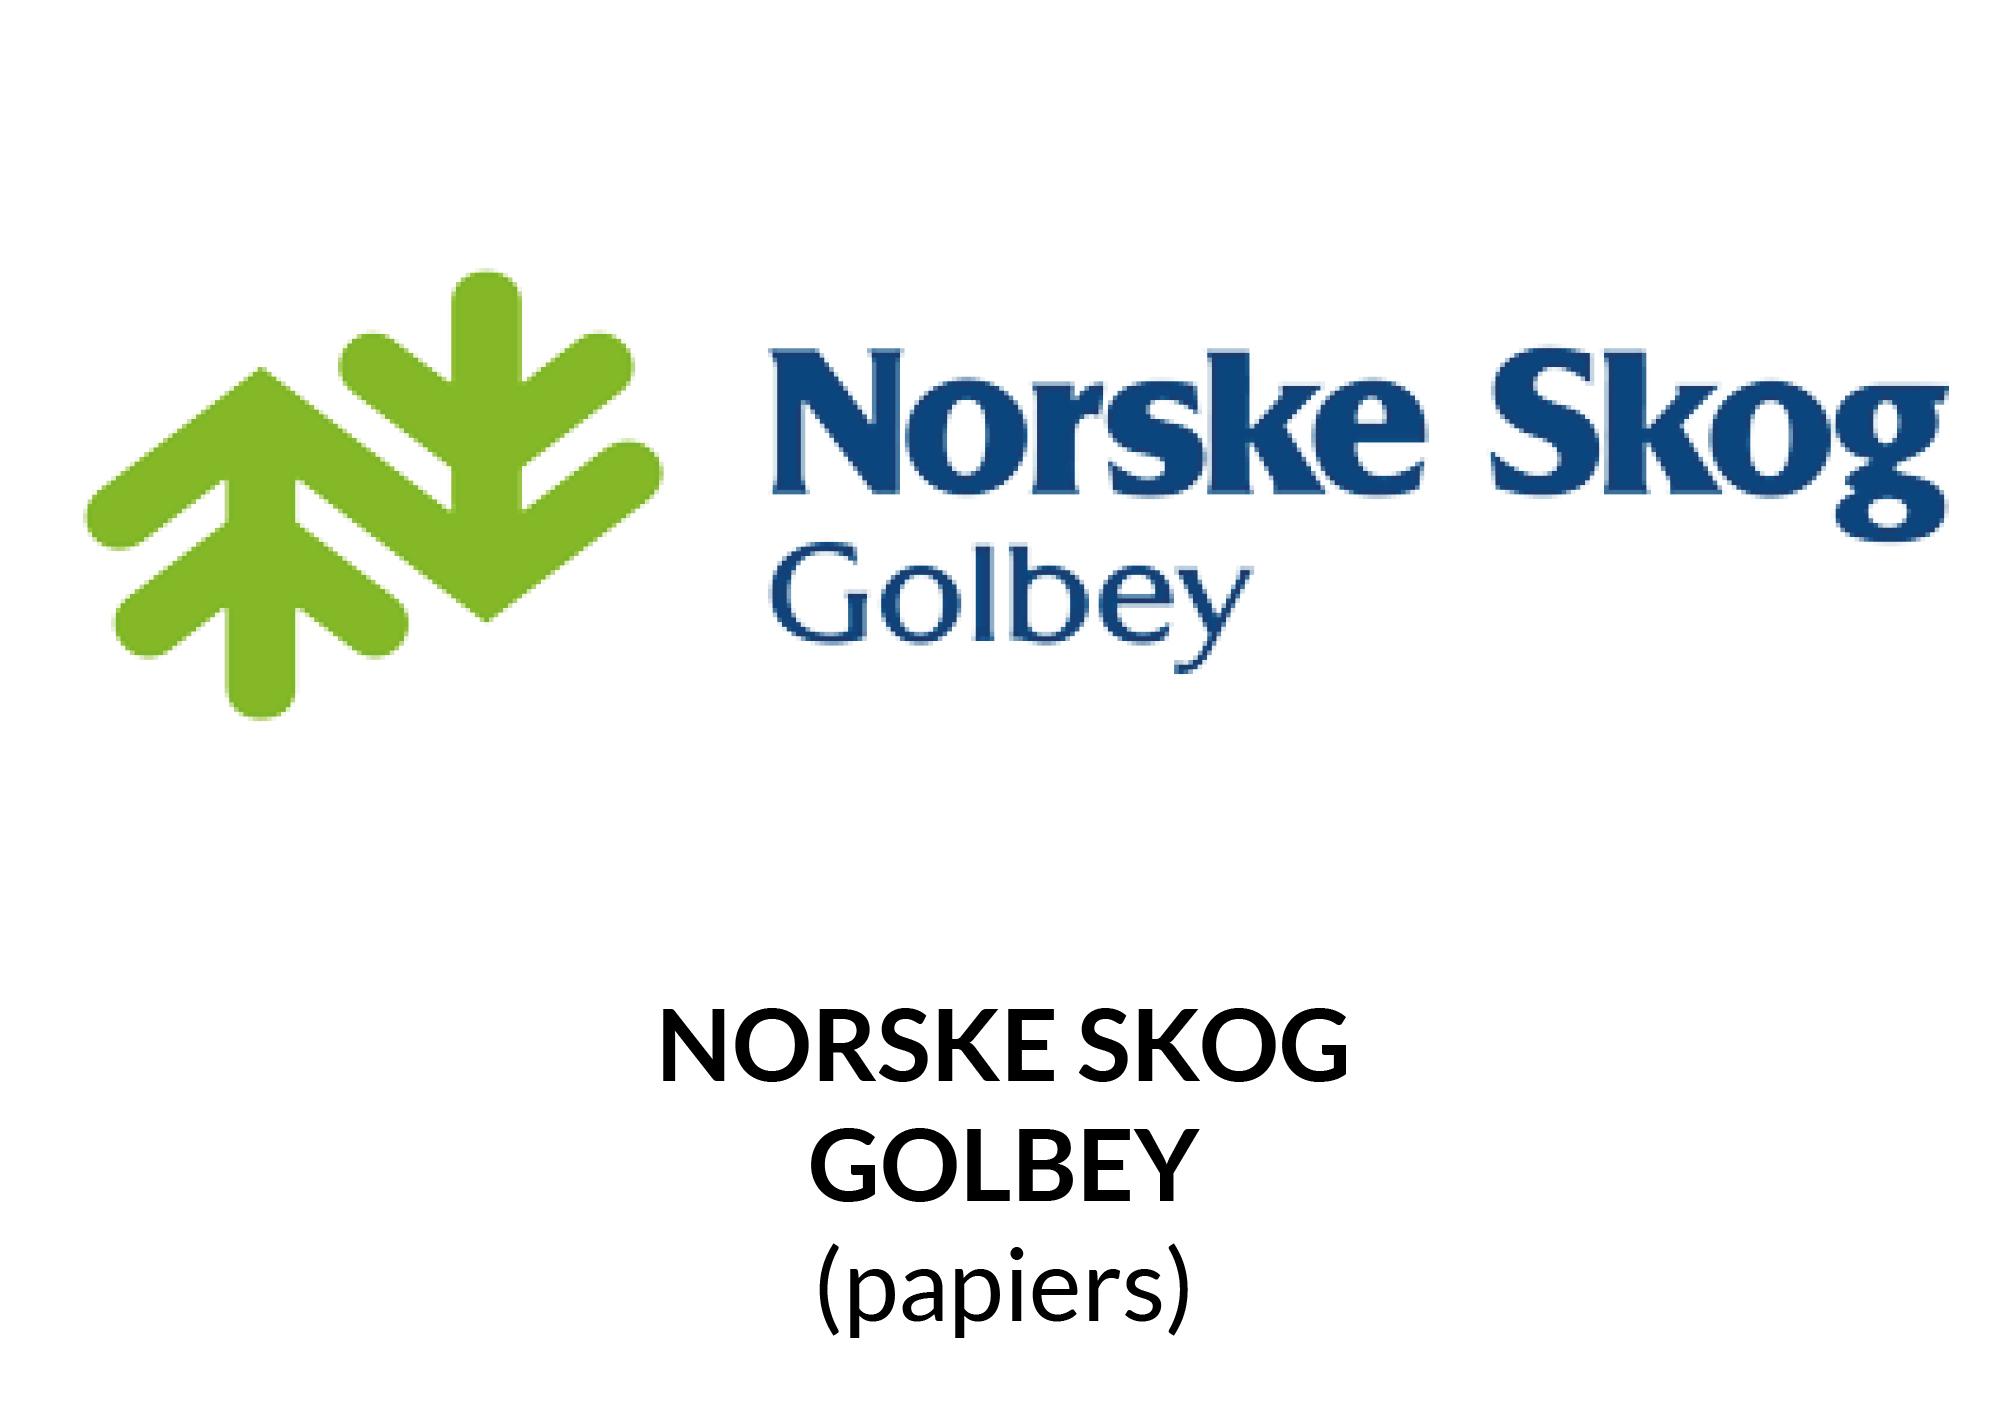 LOGO Norske Skog - GOLBEY